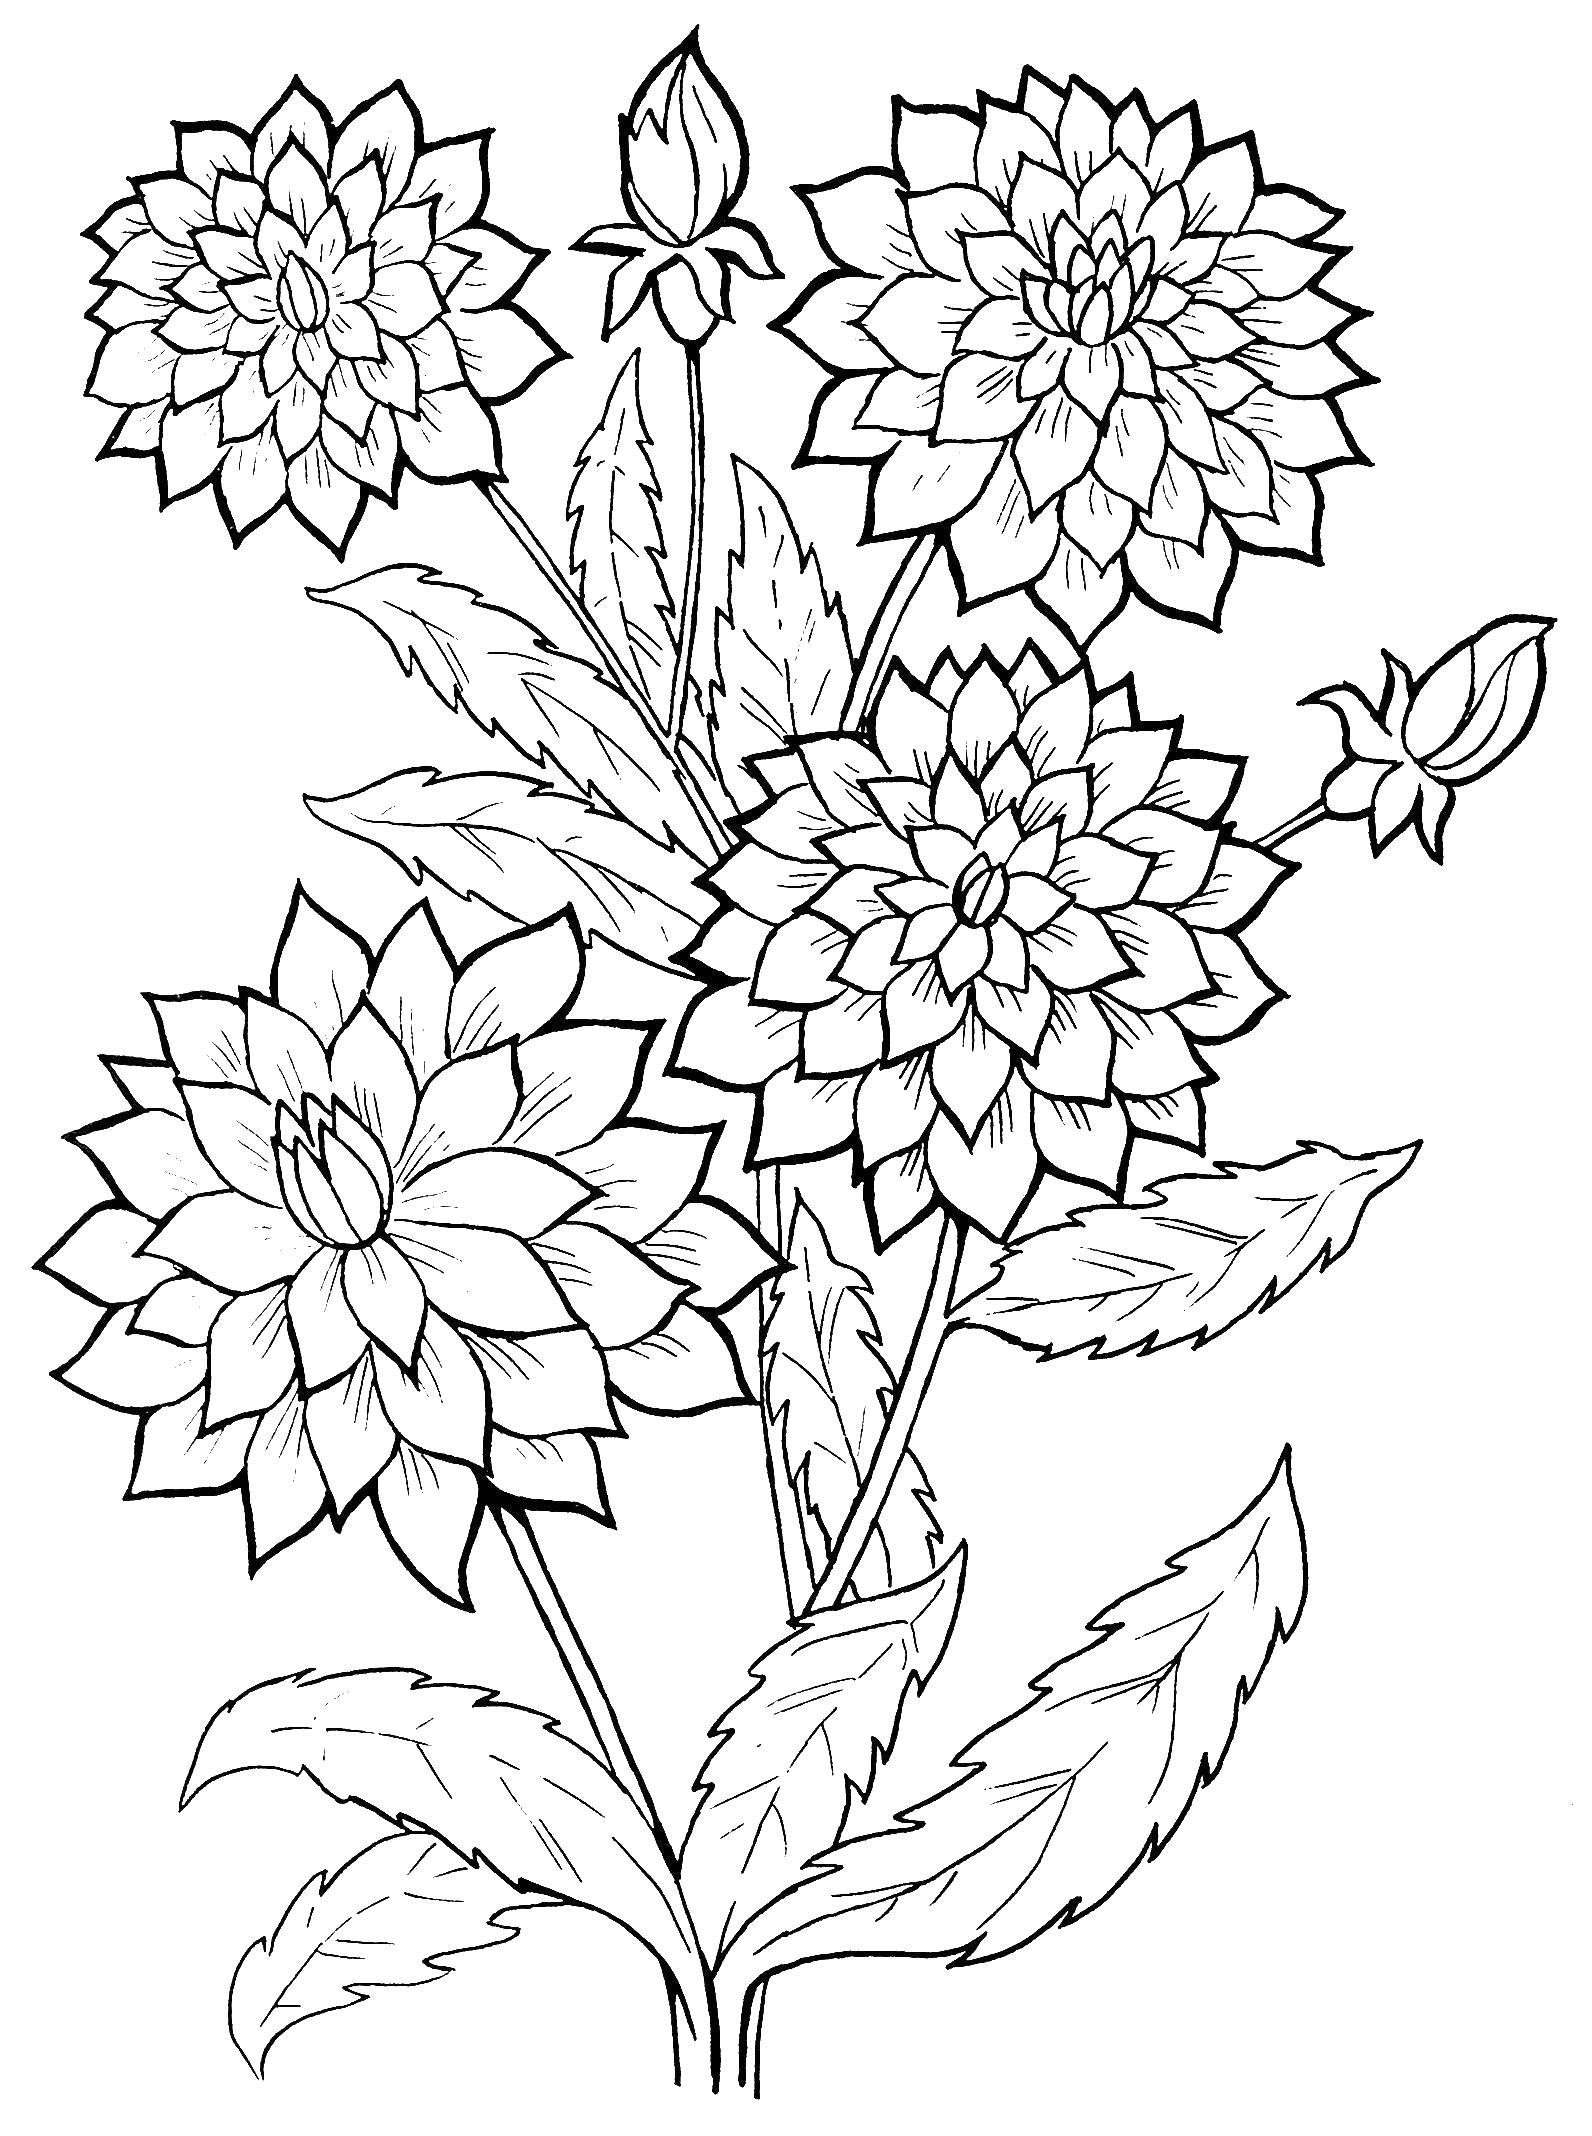 Цветы густые Онлайн бесплатные раскраски цветы